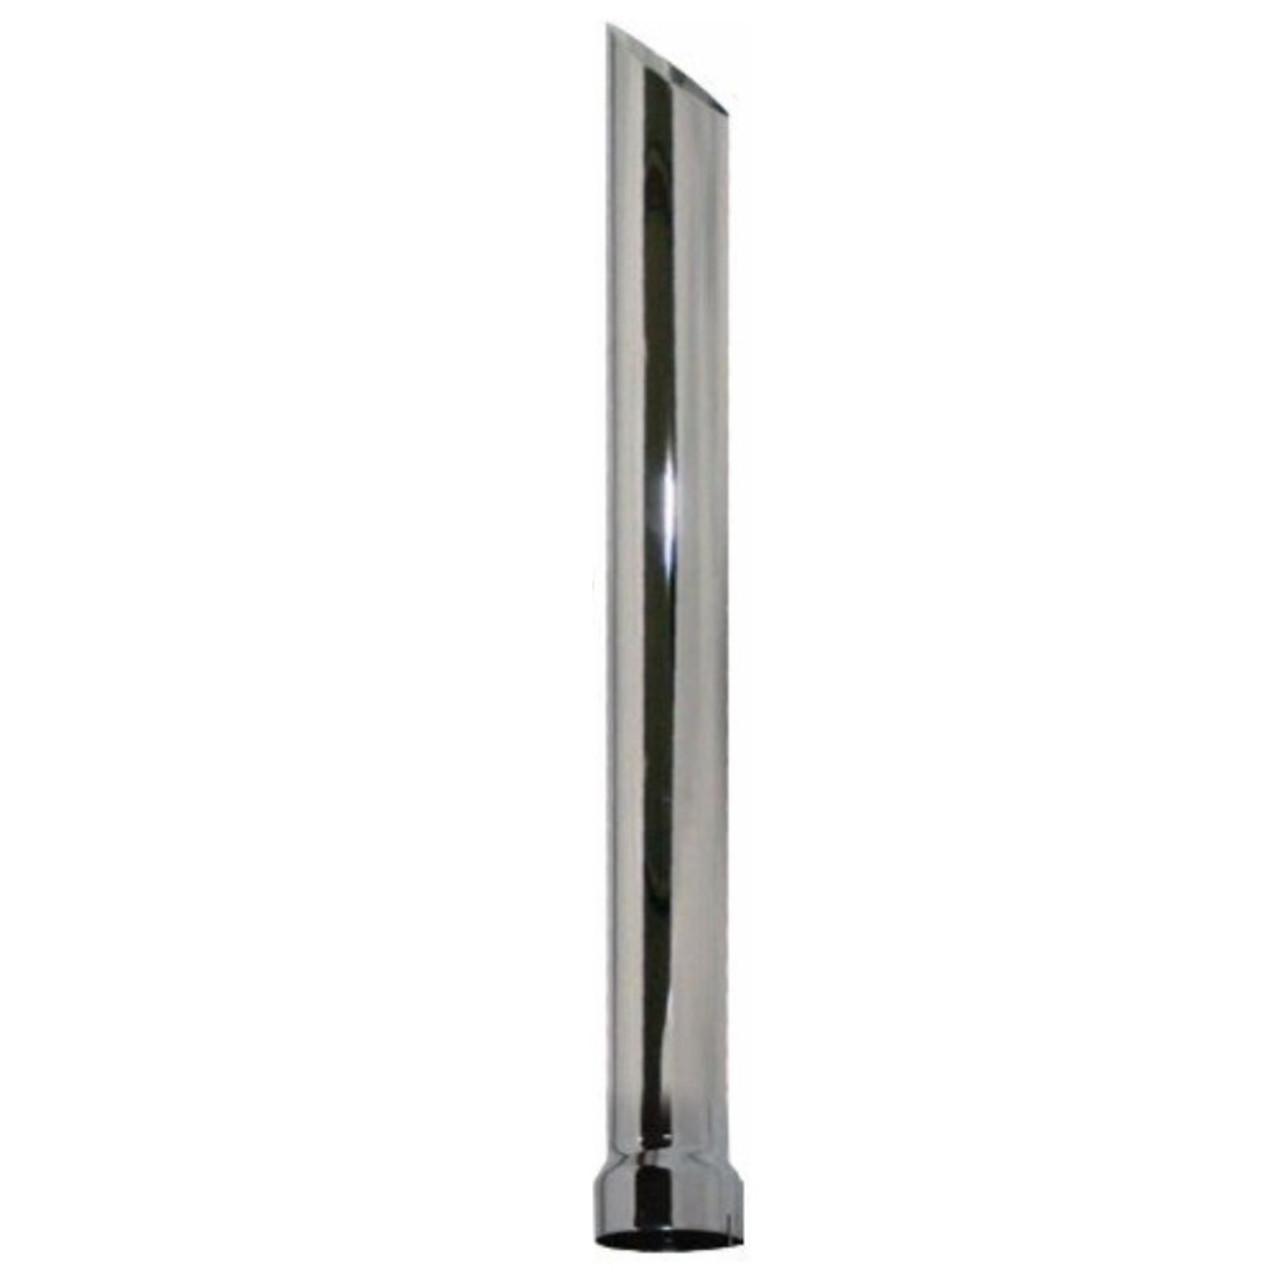 P4-36SBC 4 inch x 36 inch Miter or Angle Cut OD Chrome